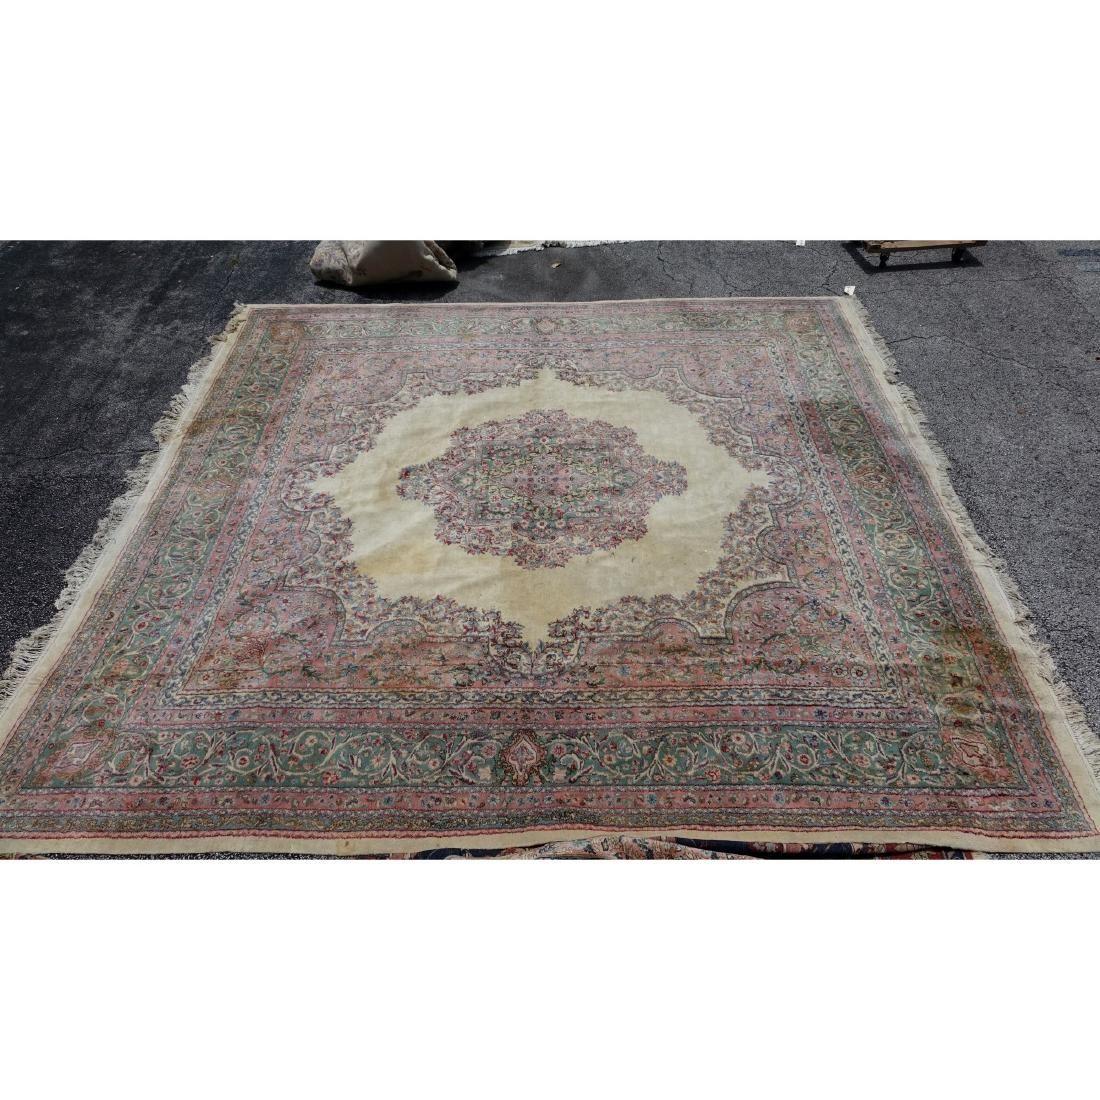 Semi Antique Kerman rug